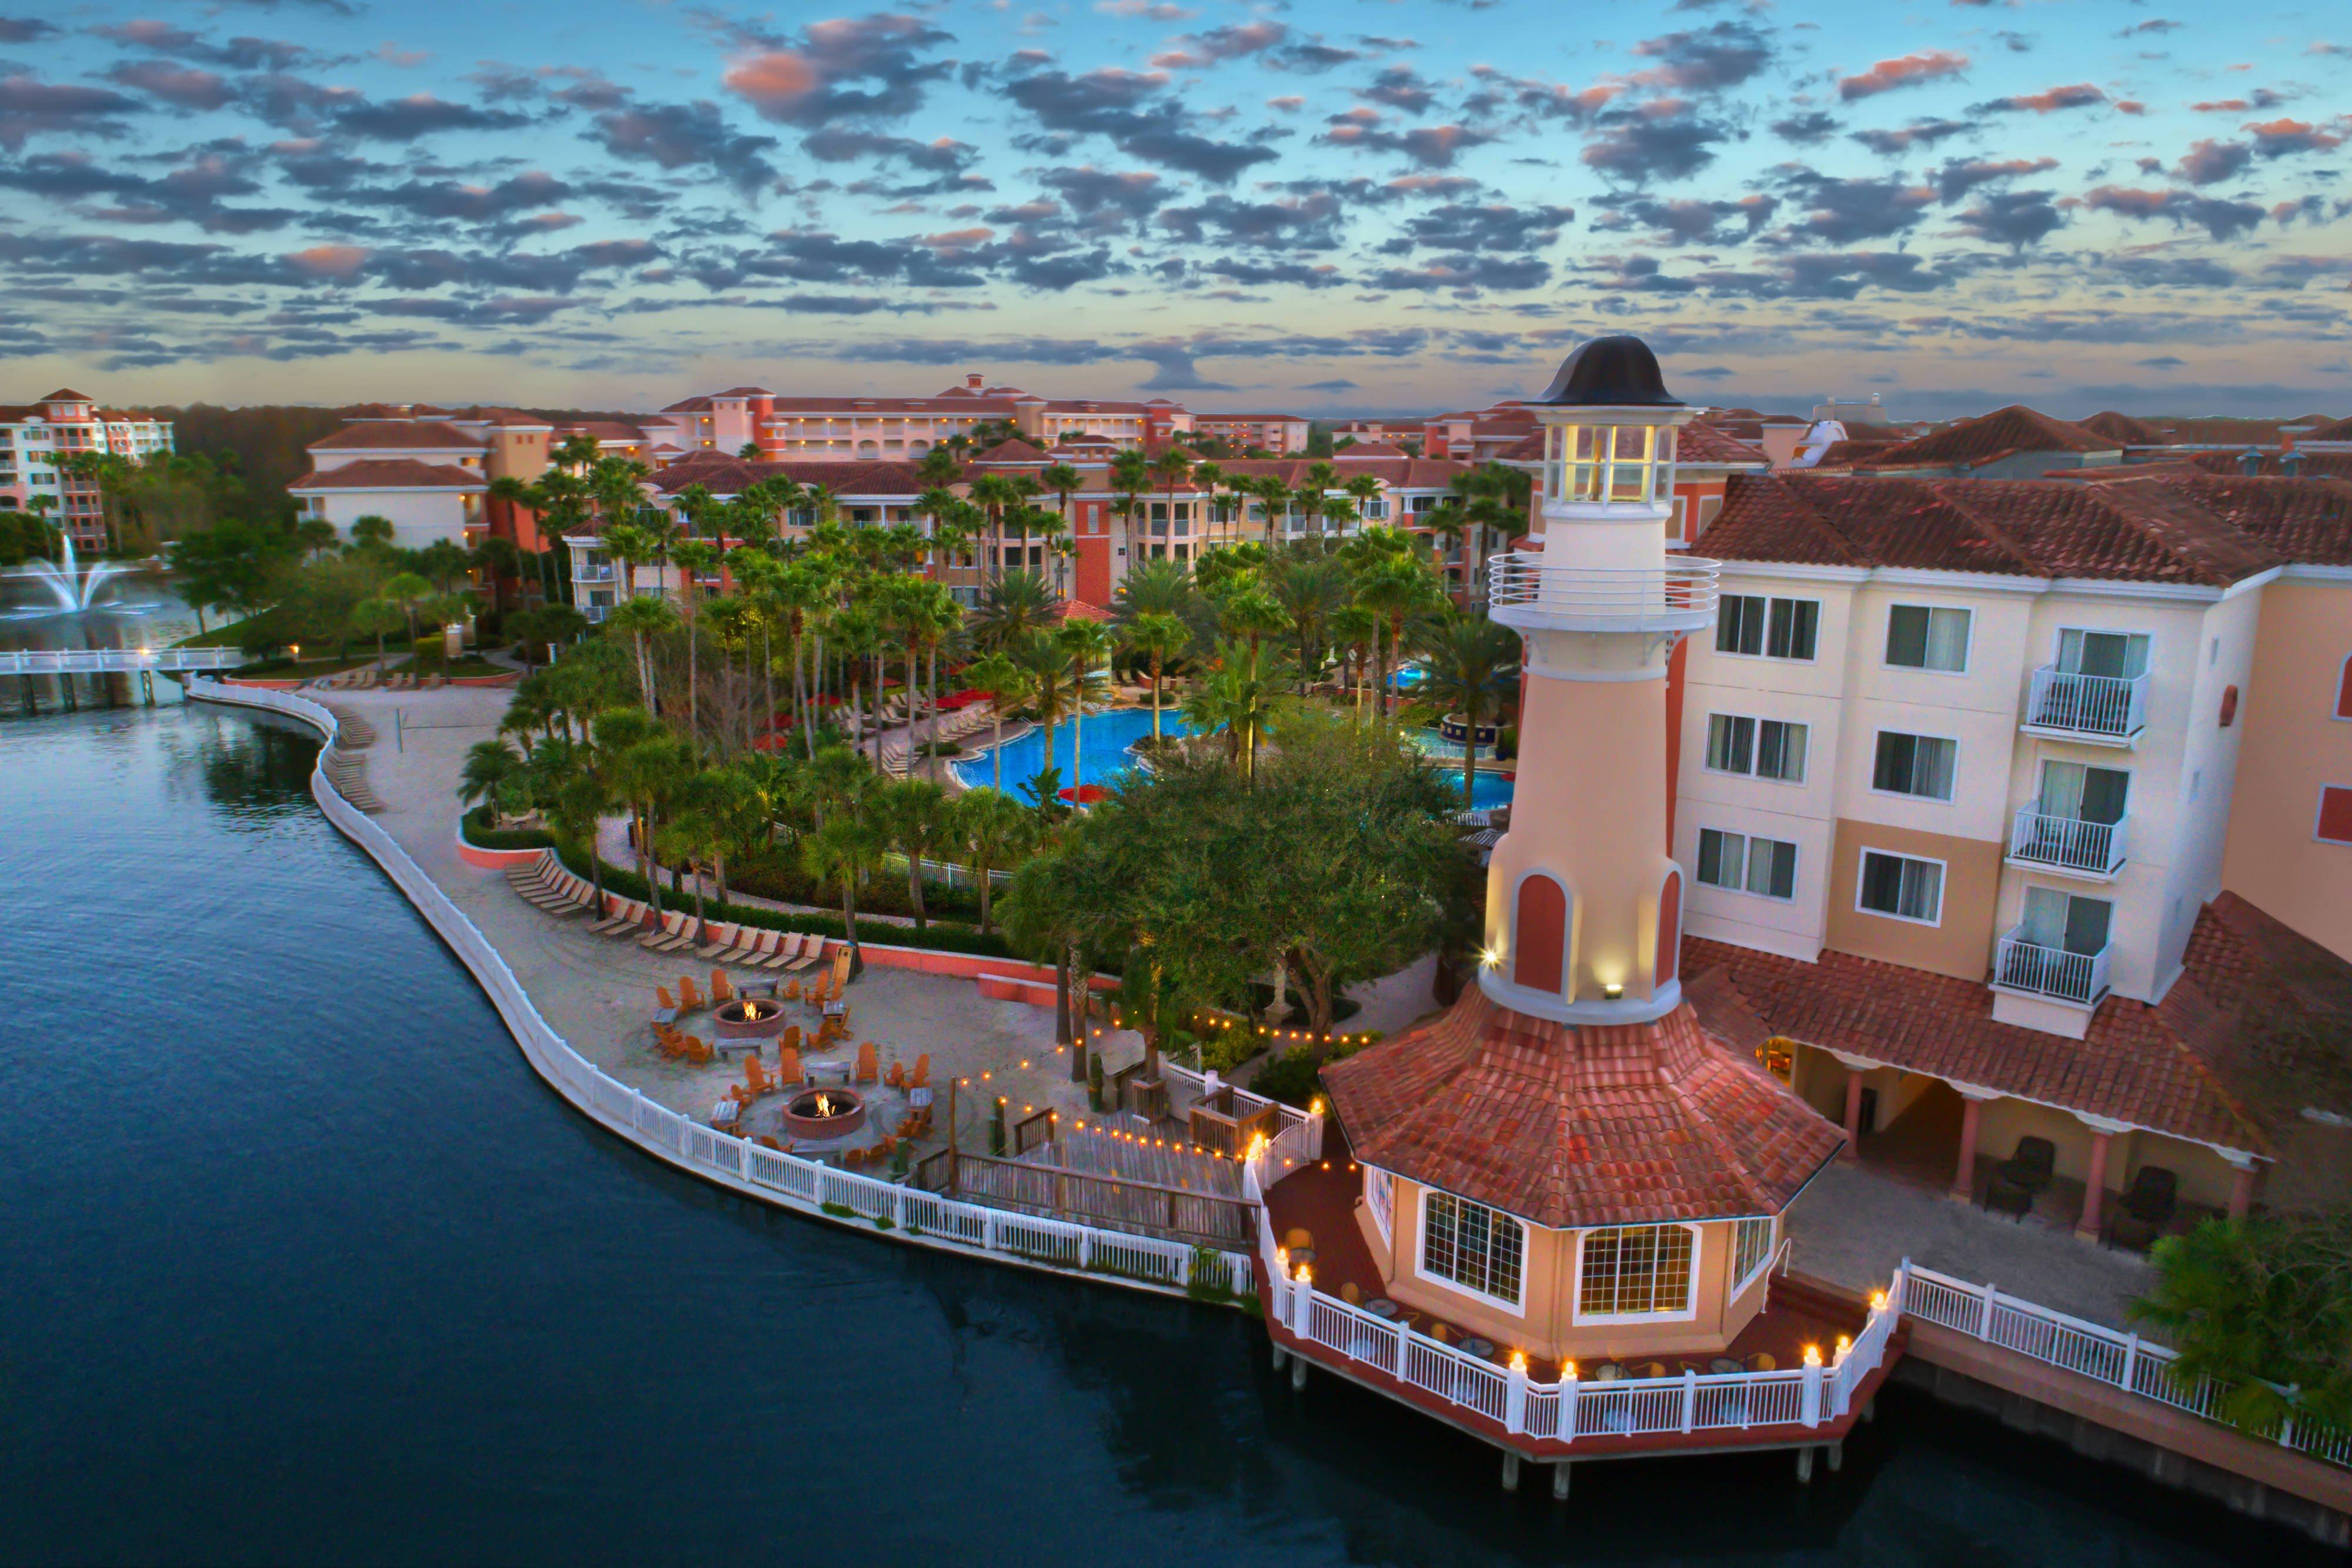 Marriott S Grande Vista First Class Orlando Fl Hotels Gds Reservation Codes Travel Weekly